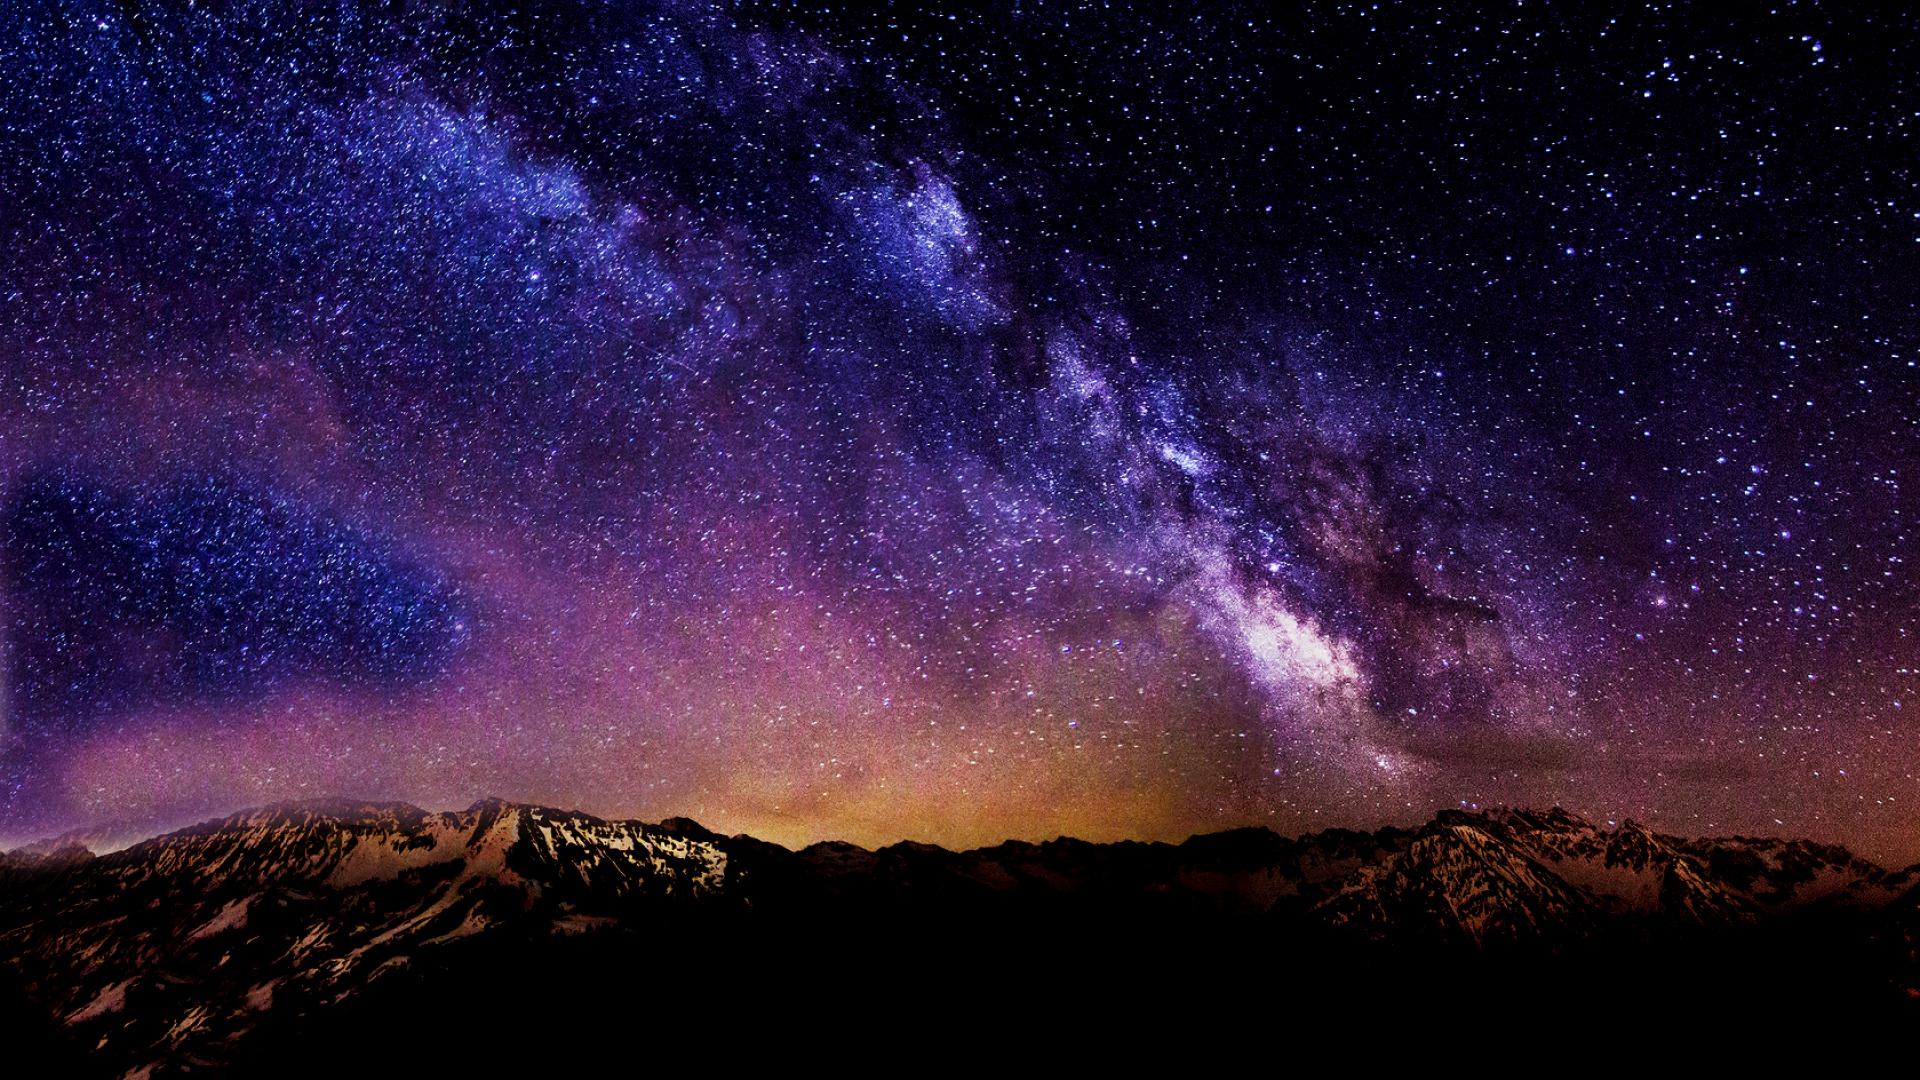 ... Starry Starry Night HD Desktop Background